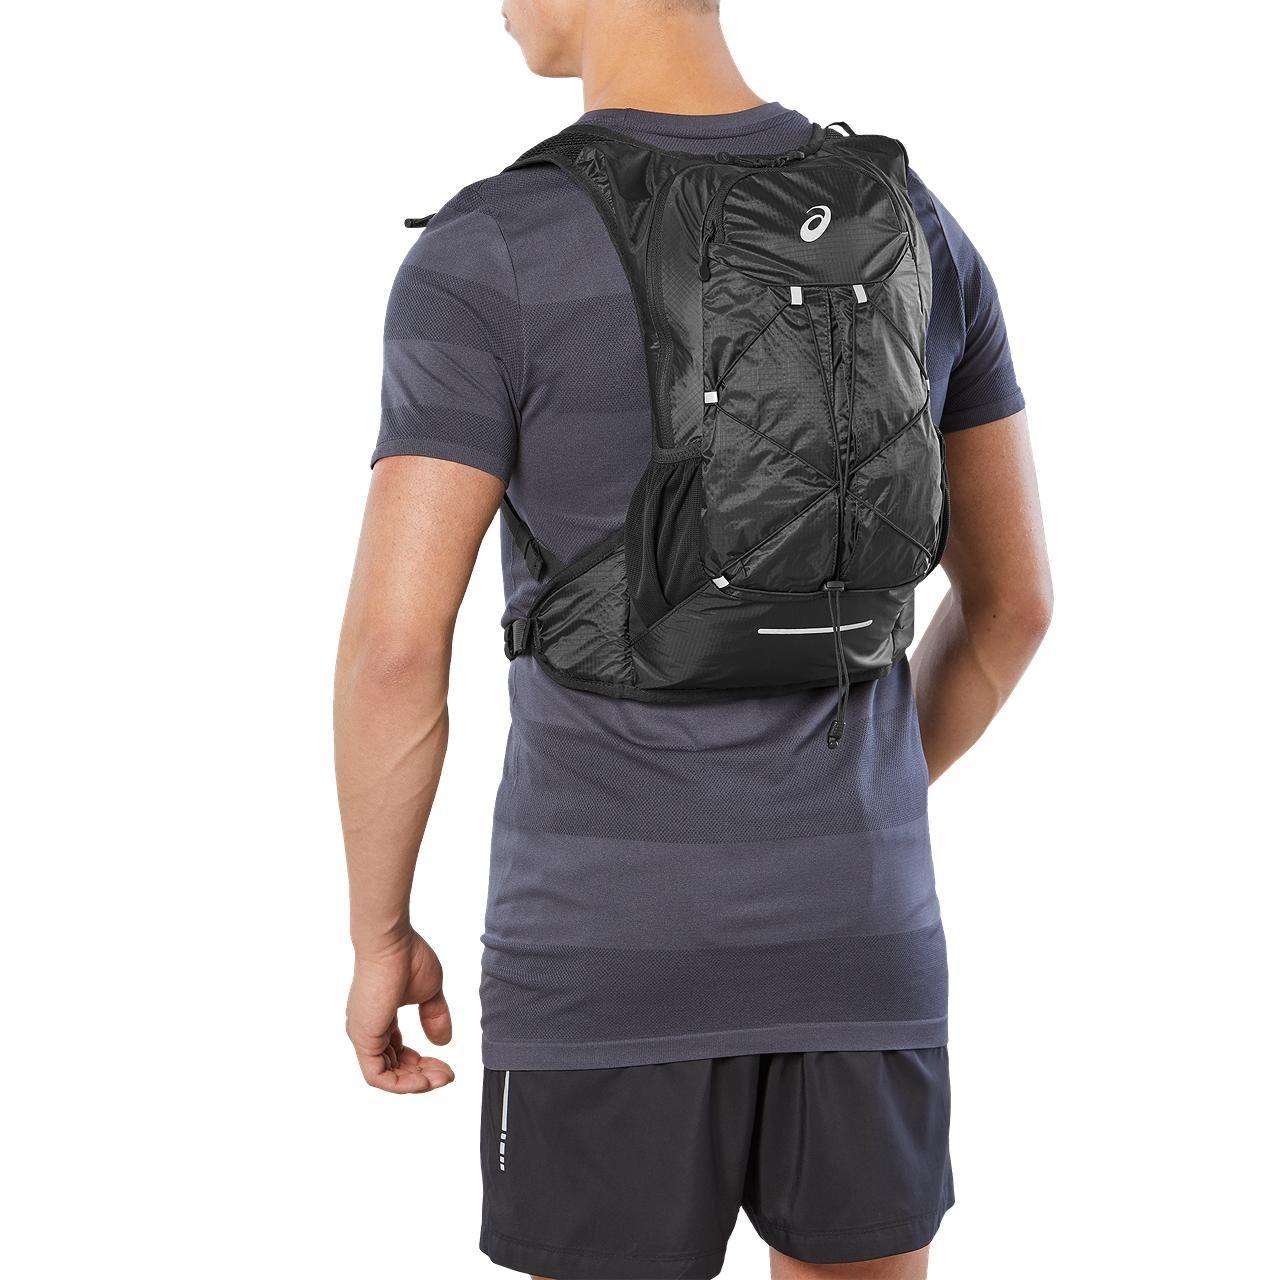 Asics Lightweight Running Backpack (Black)